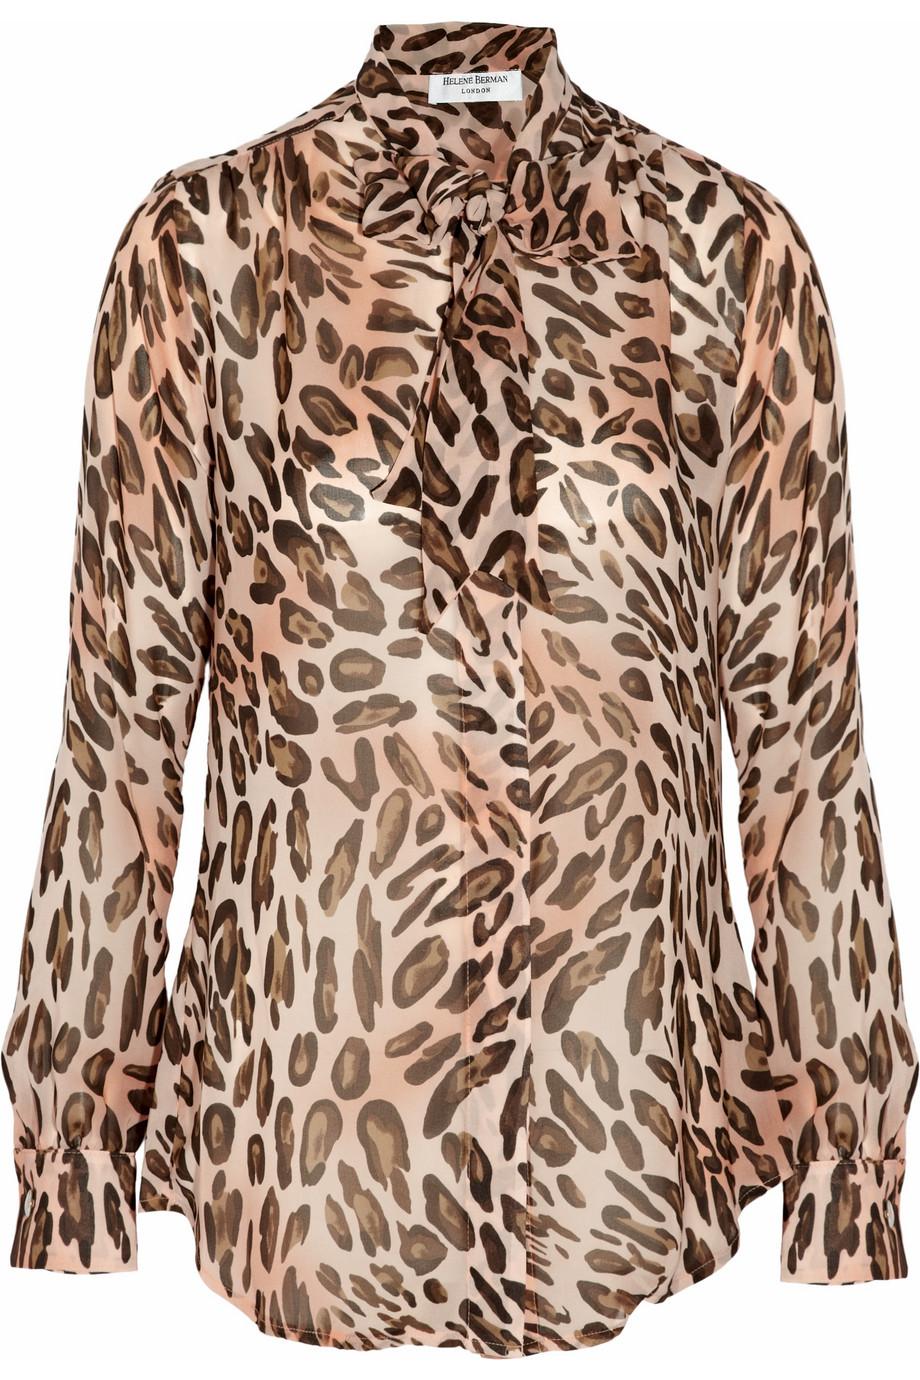 bbc87561e637d1 Lyst - Helene Berman Leopard-print Chiffon Blouse